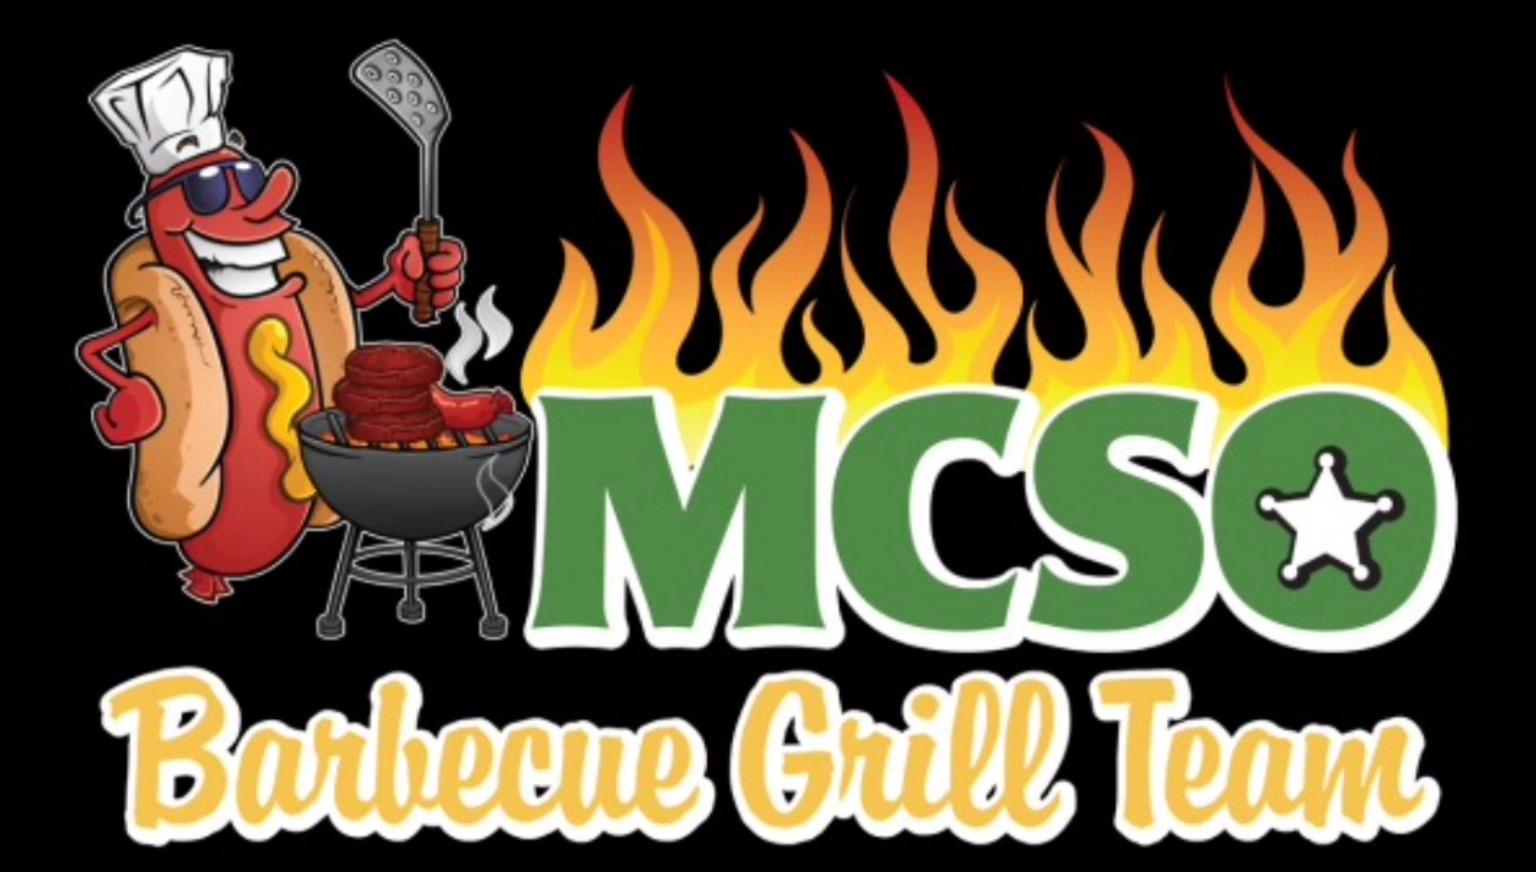 MCSO Grill Team.JPG